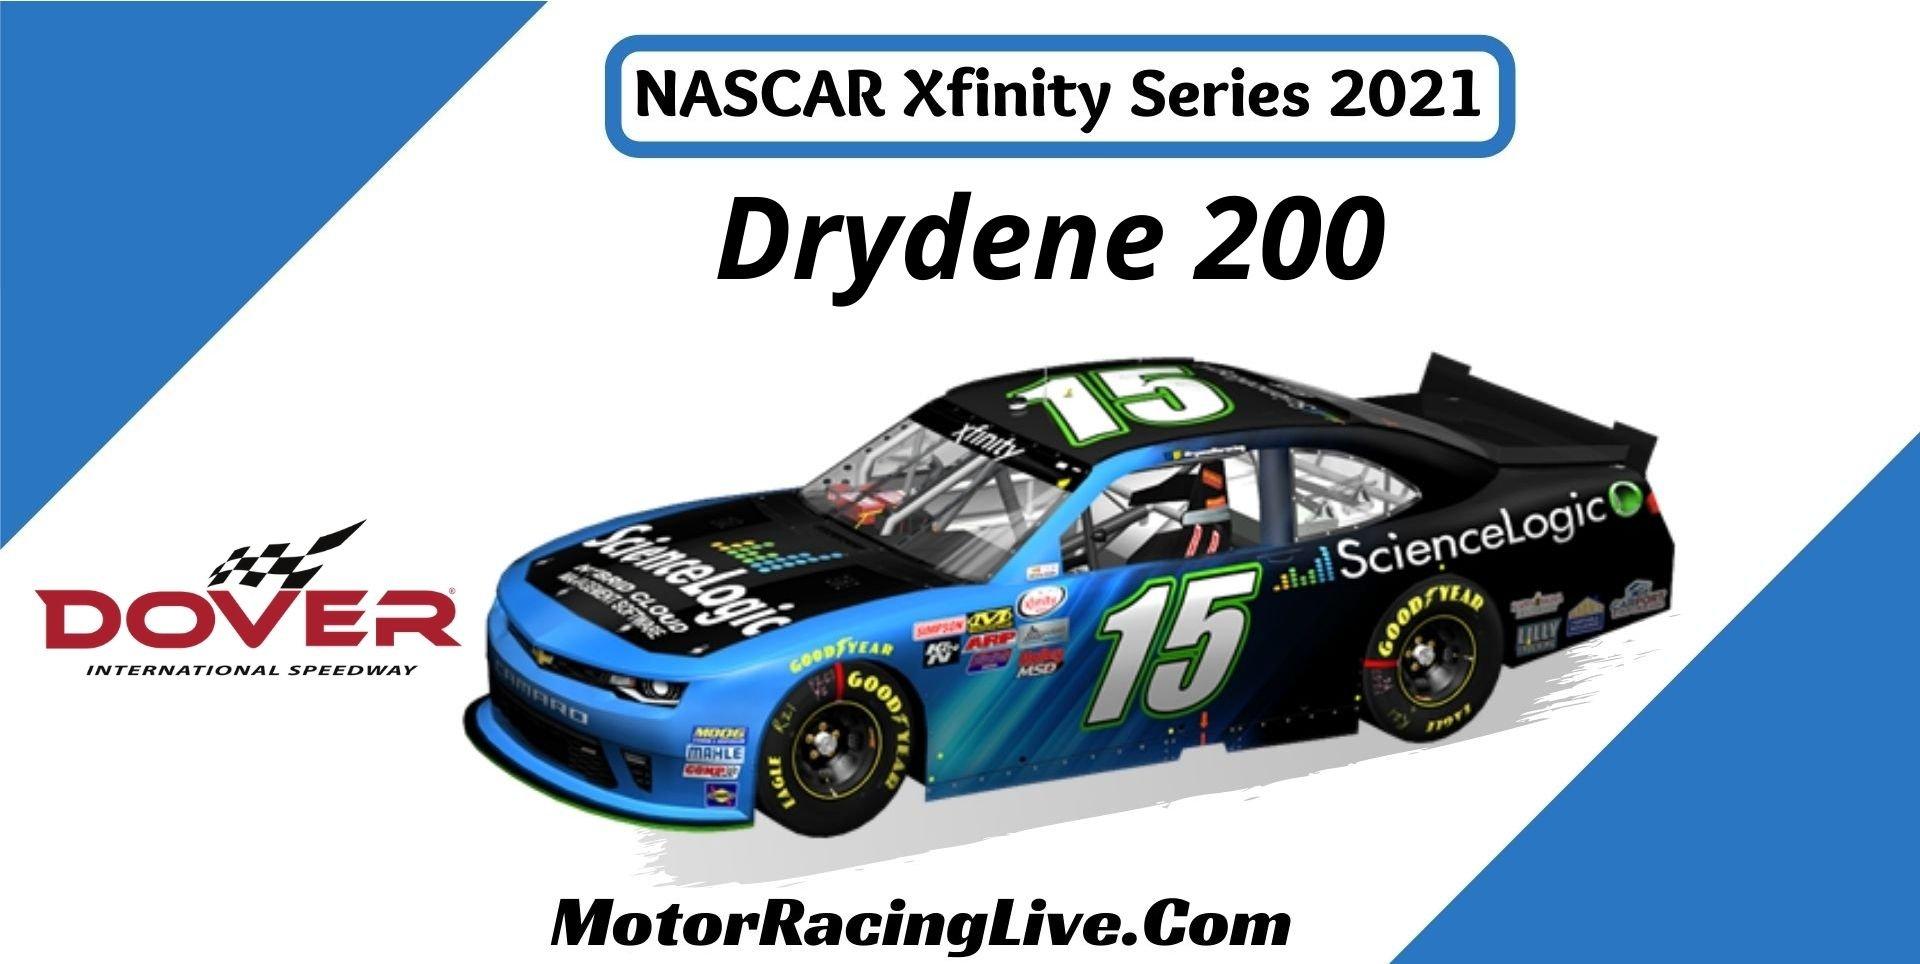 Drydene 200 Nascar Xfinity Series 2021 Live Stream